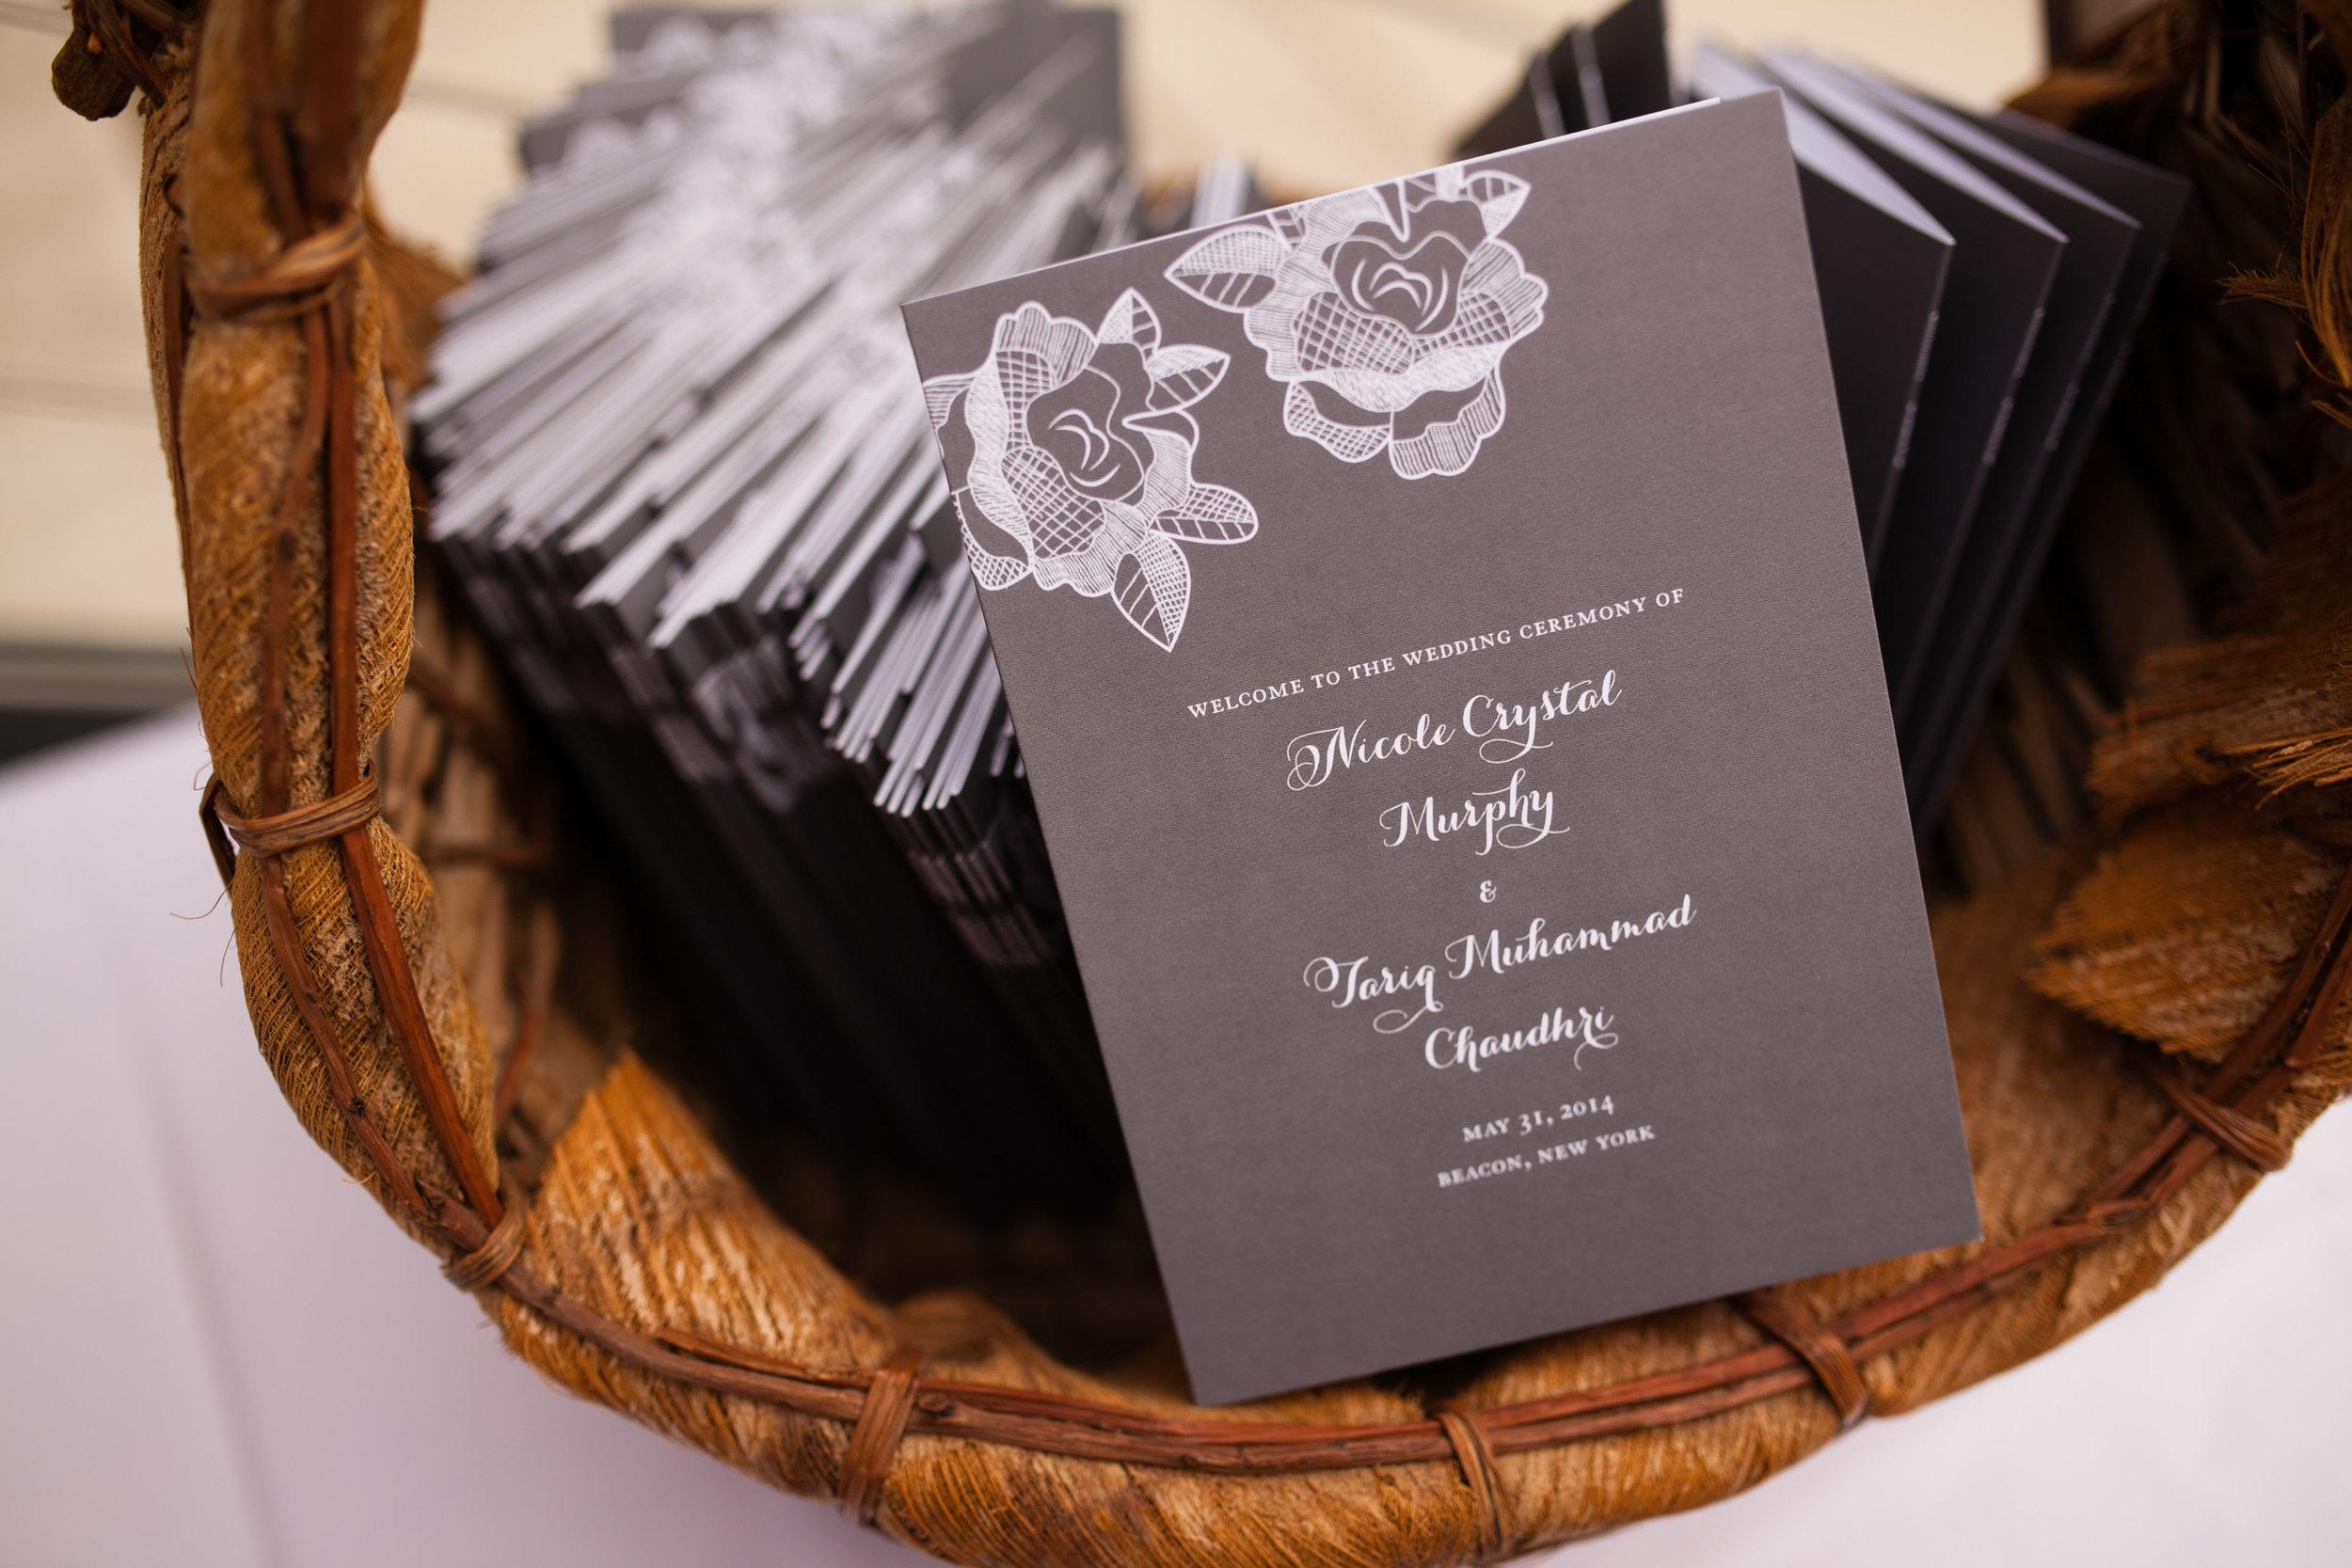 Ceremony program by Roseville Designs.